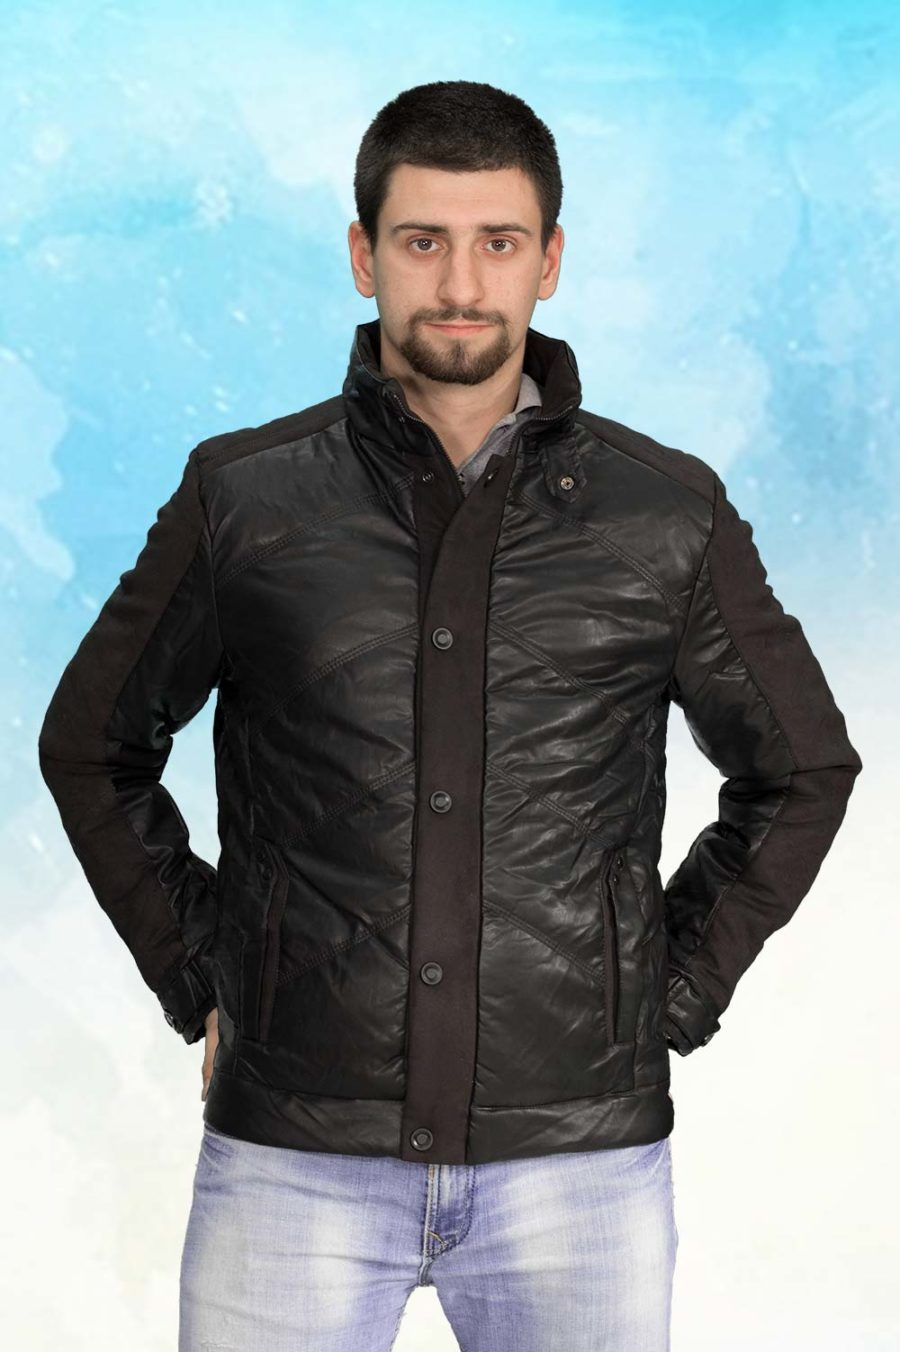 Muška prolećna jakna - Sportska i Casual -ALN-52161-Crna